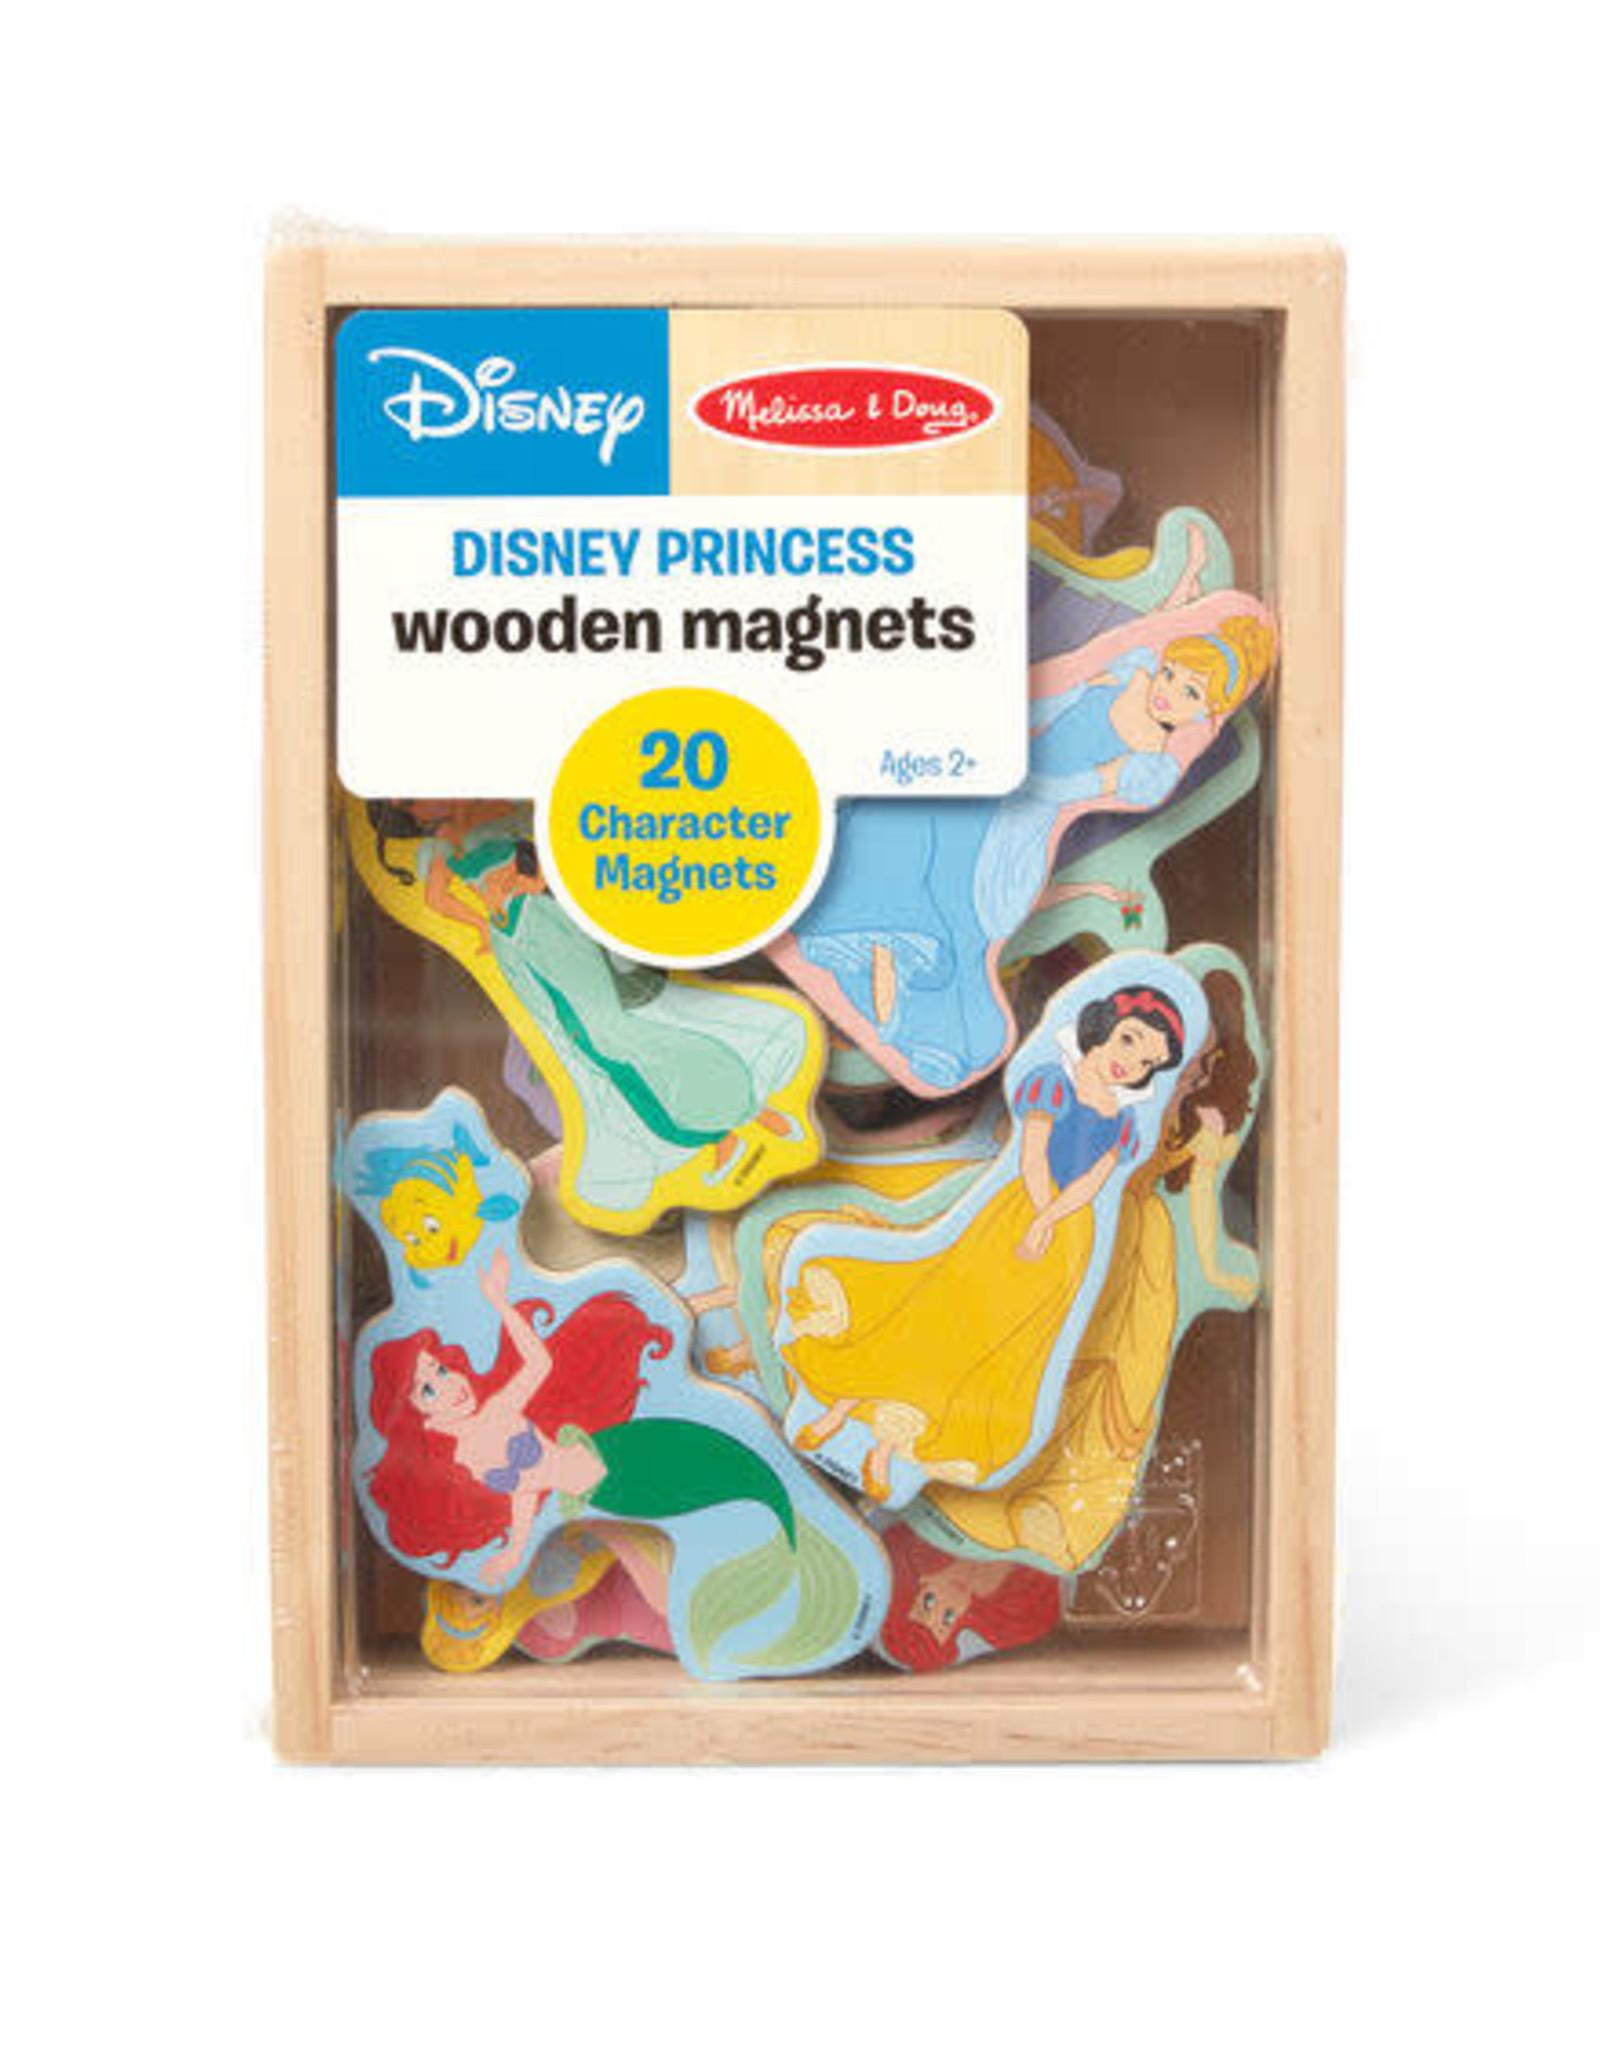 Melissa & Doug MD Wooden Magnets Disney Princess